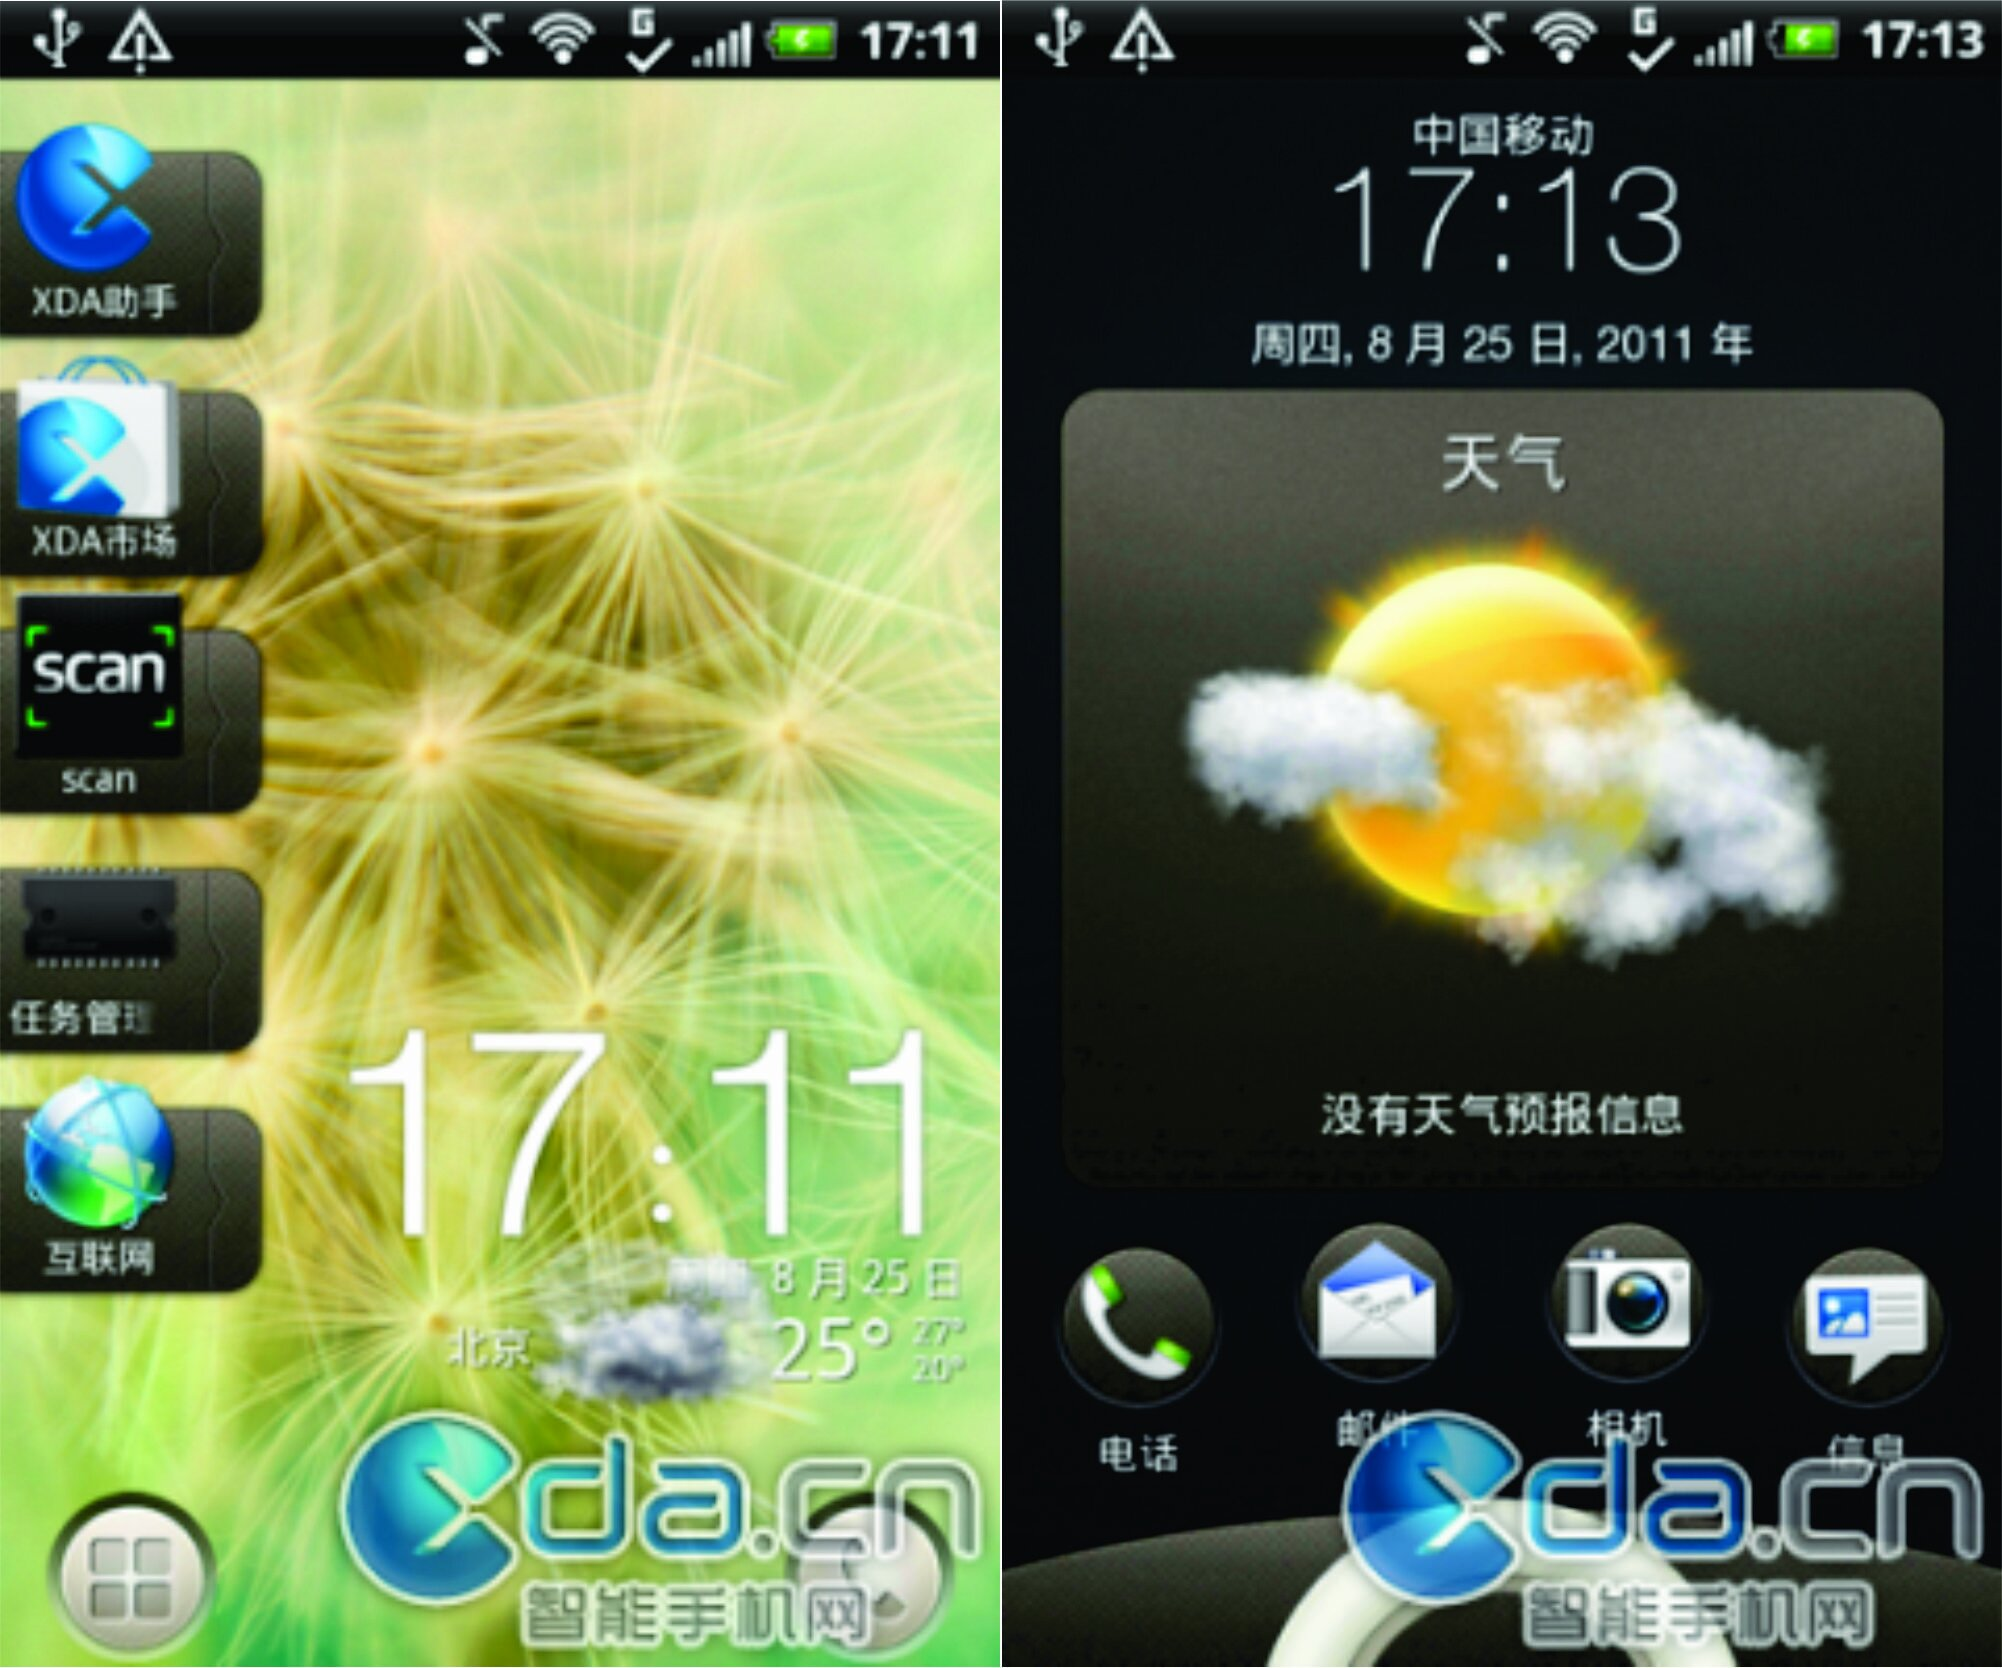 HTC Bliss UI